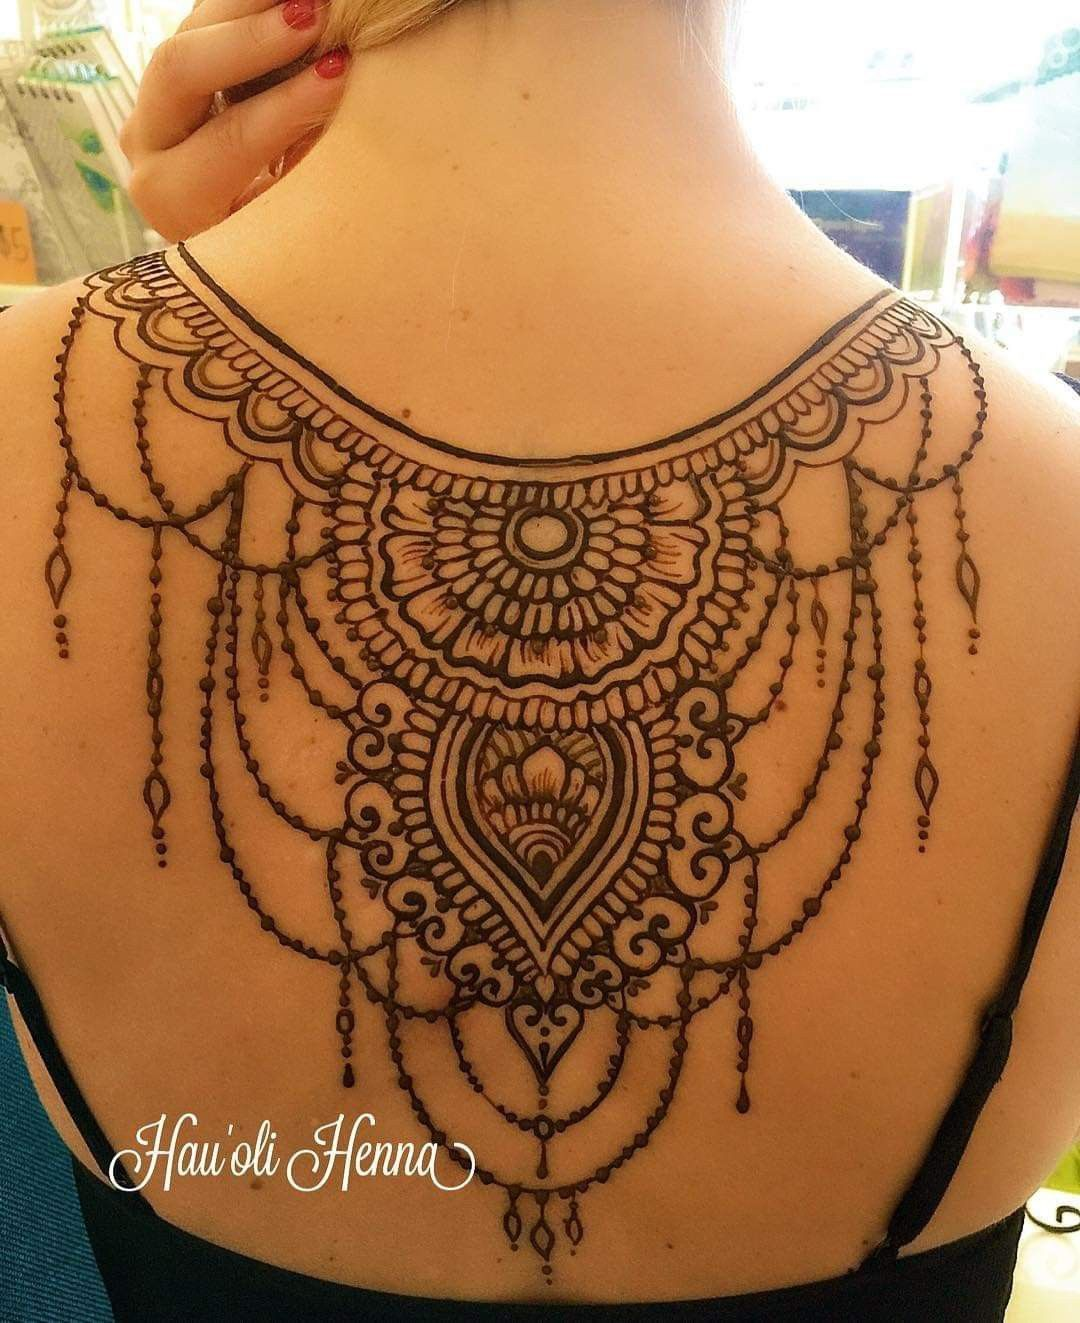 Back Henna Henna In 2020 Back Henna Henna Tattoo Designs Henna Tattoo Back